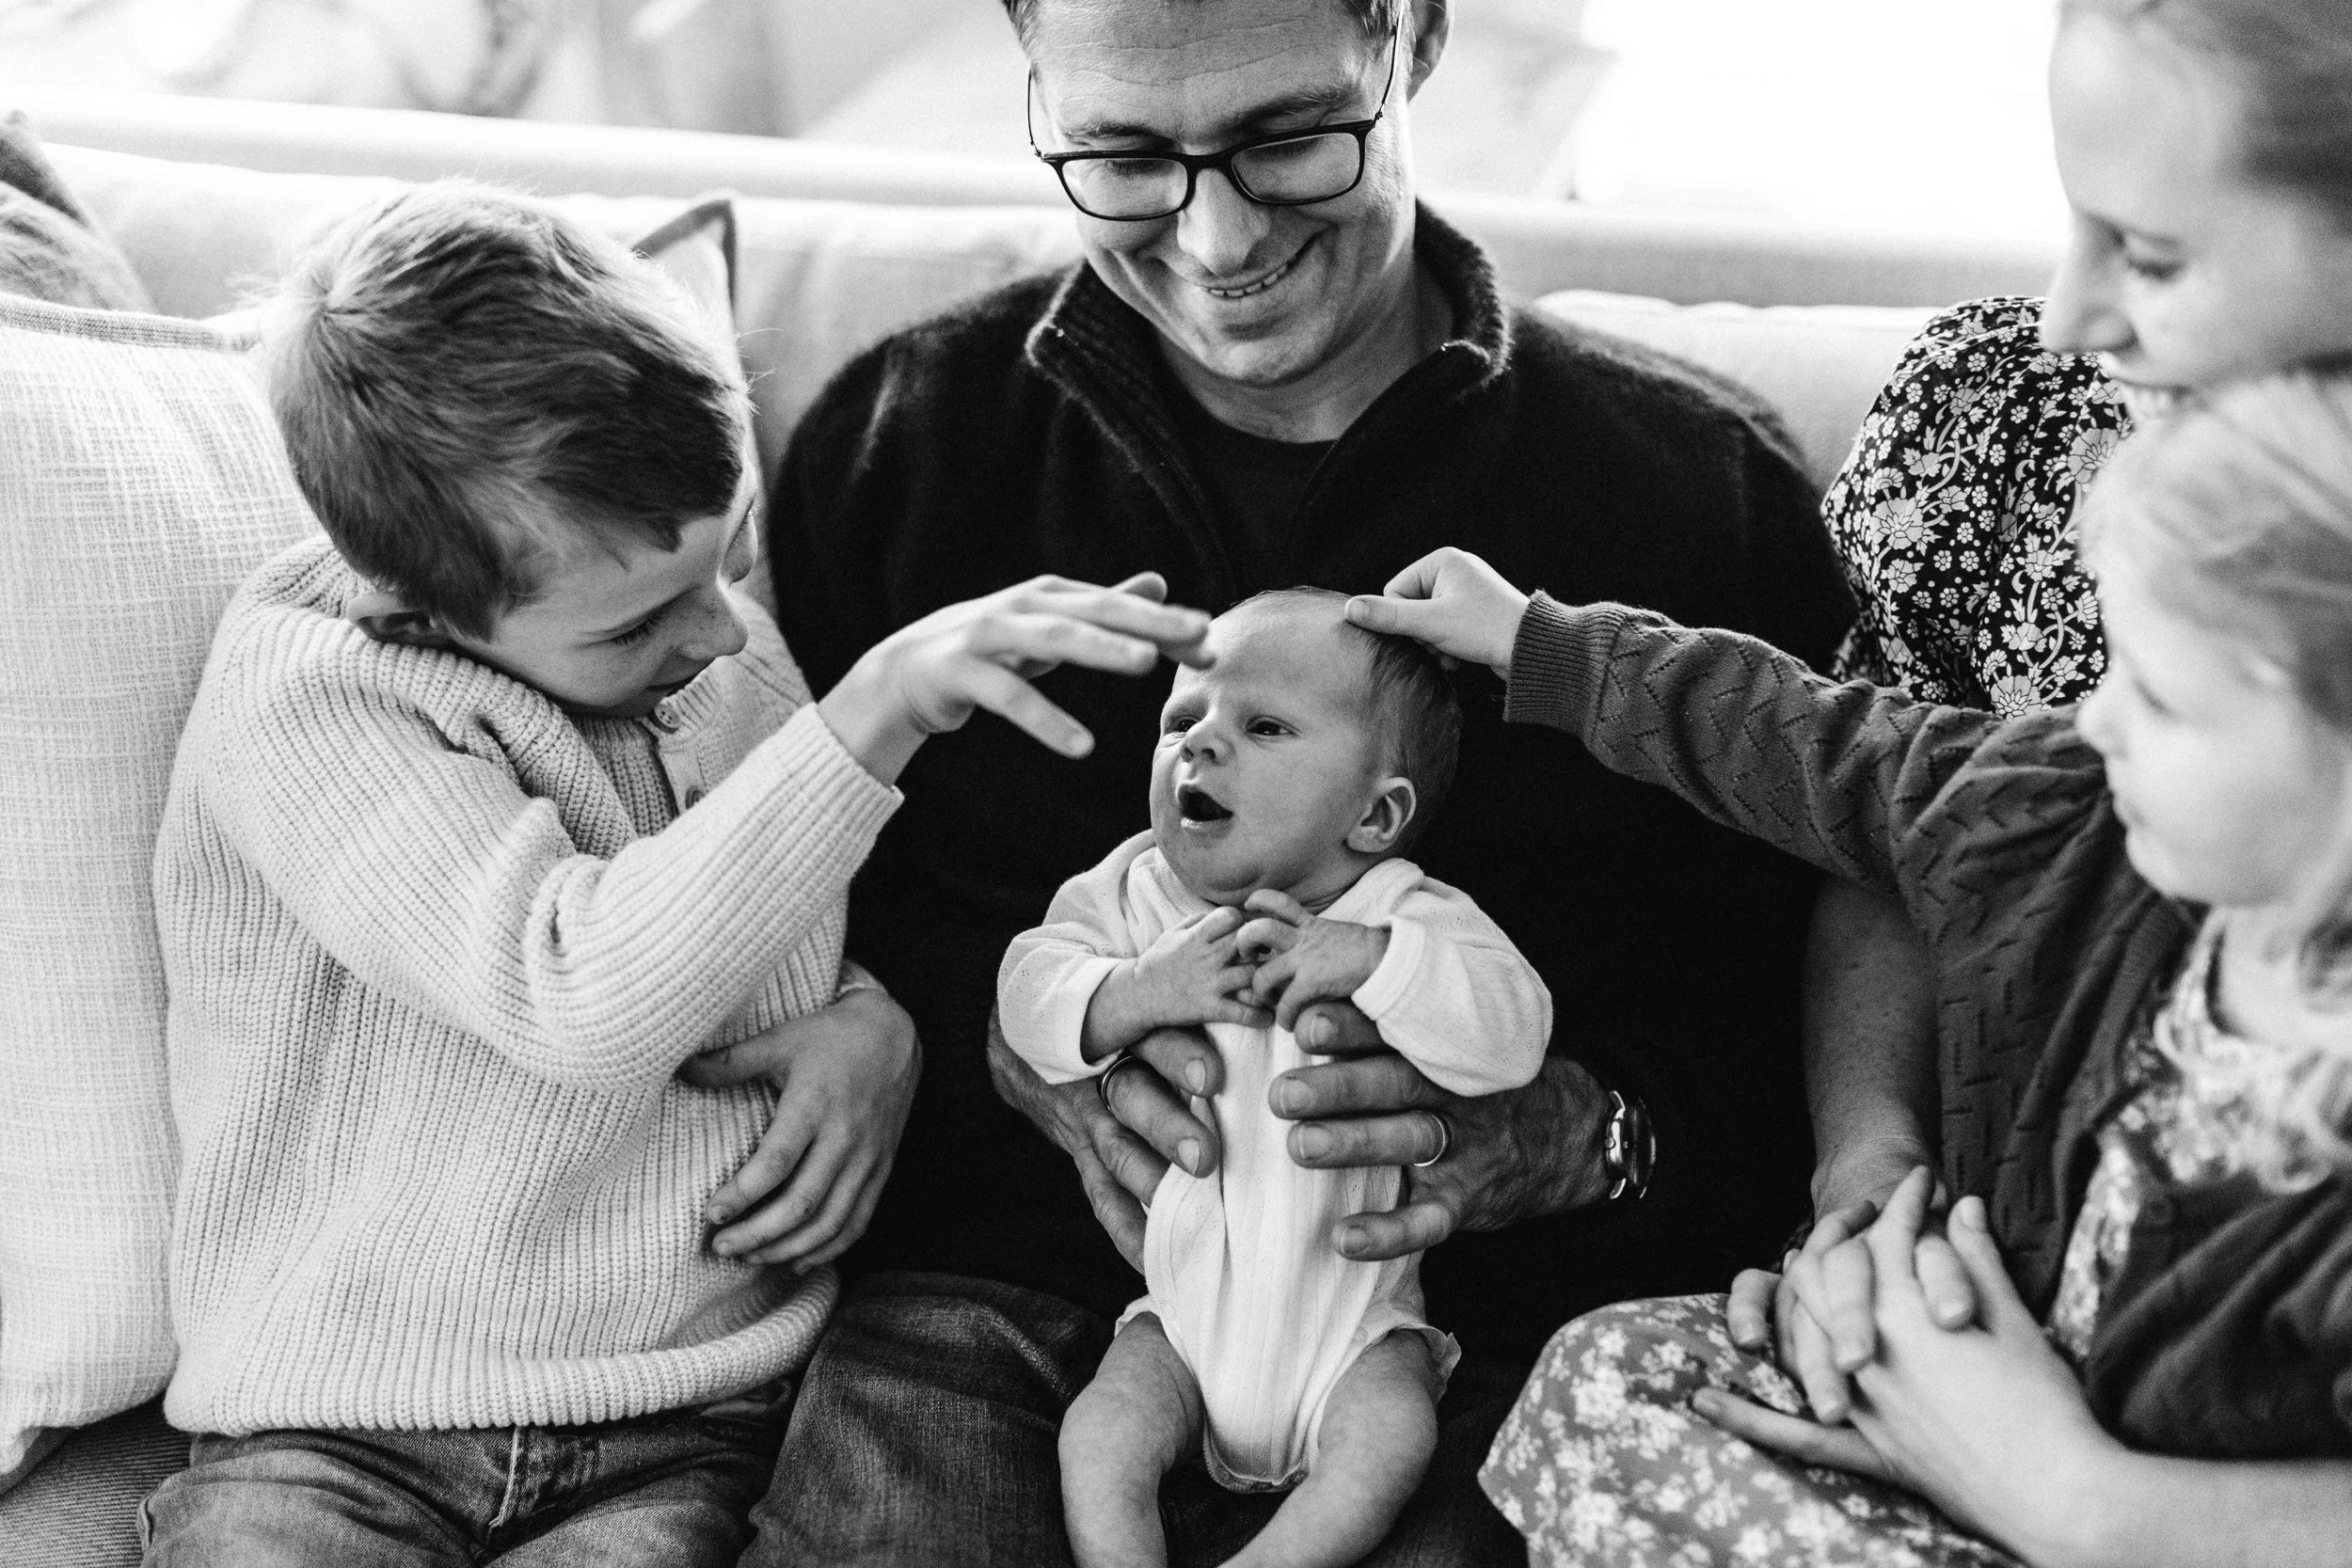 bowral-newborn-photographer-family-herrmann-southern-highlands-19.jpg